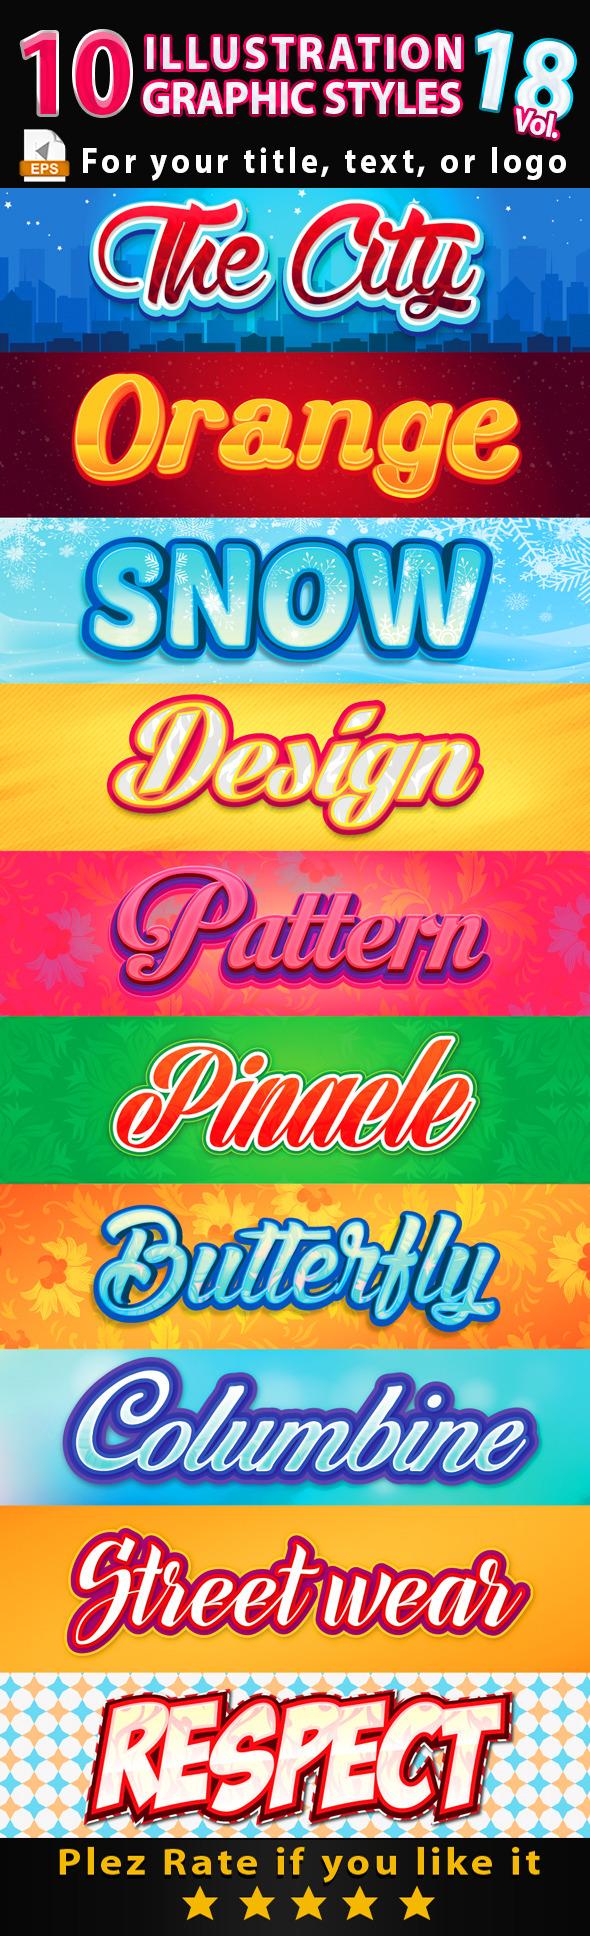 10 Illustrator Graphic Styles Vol.18